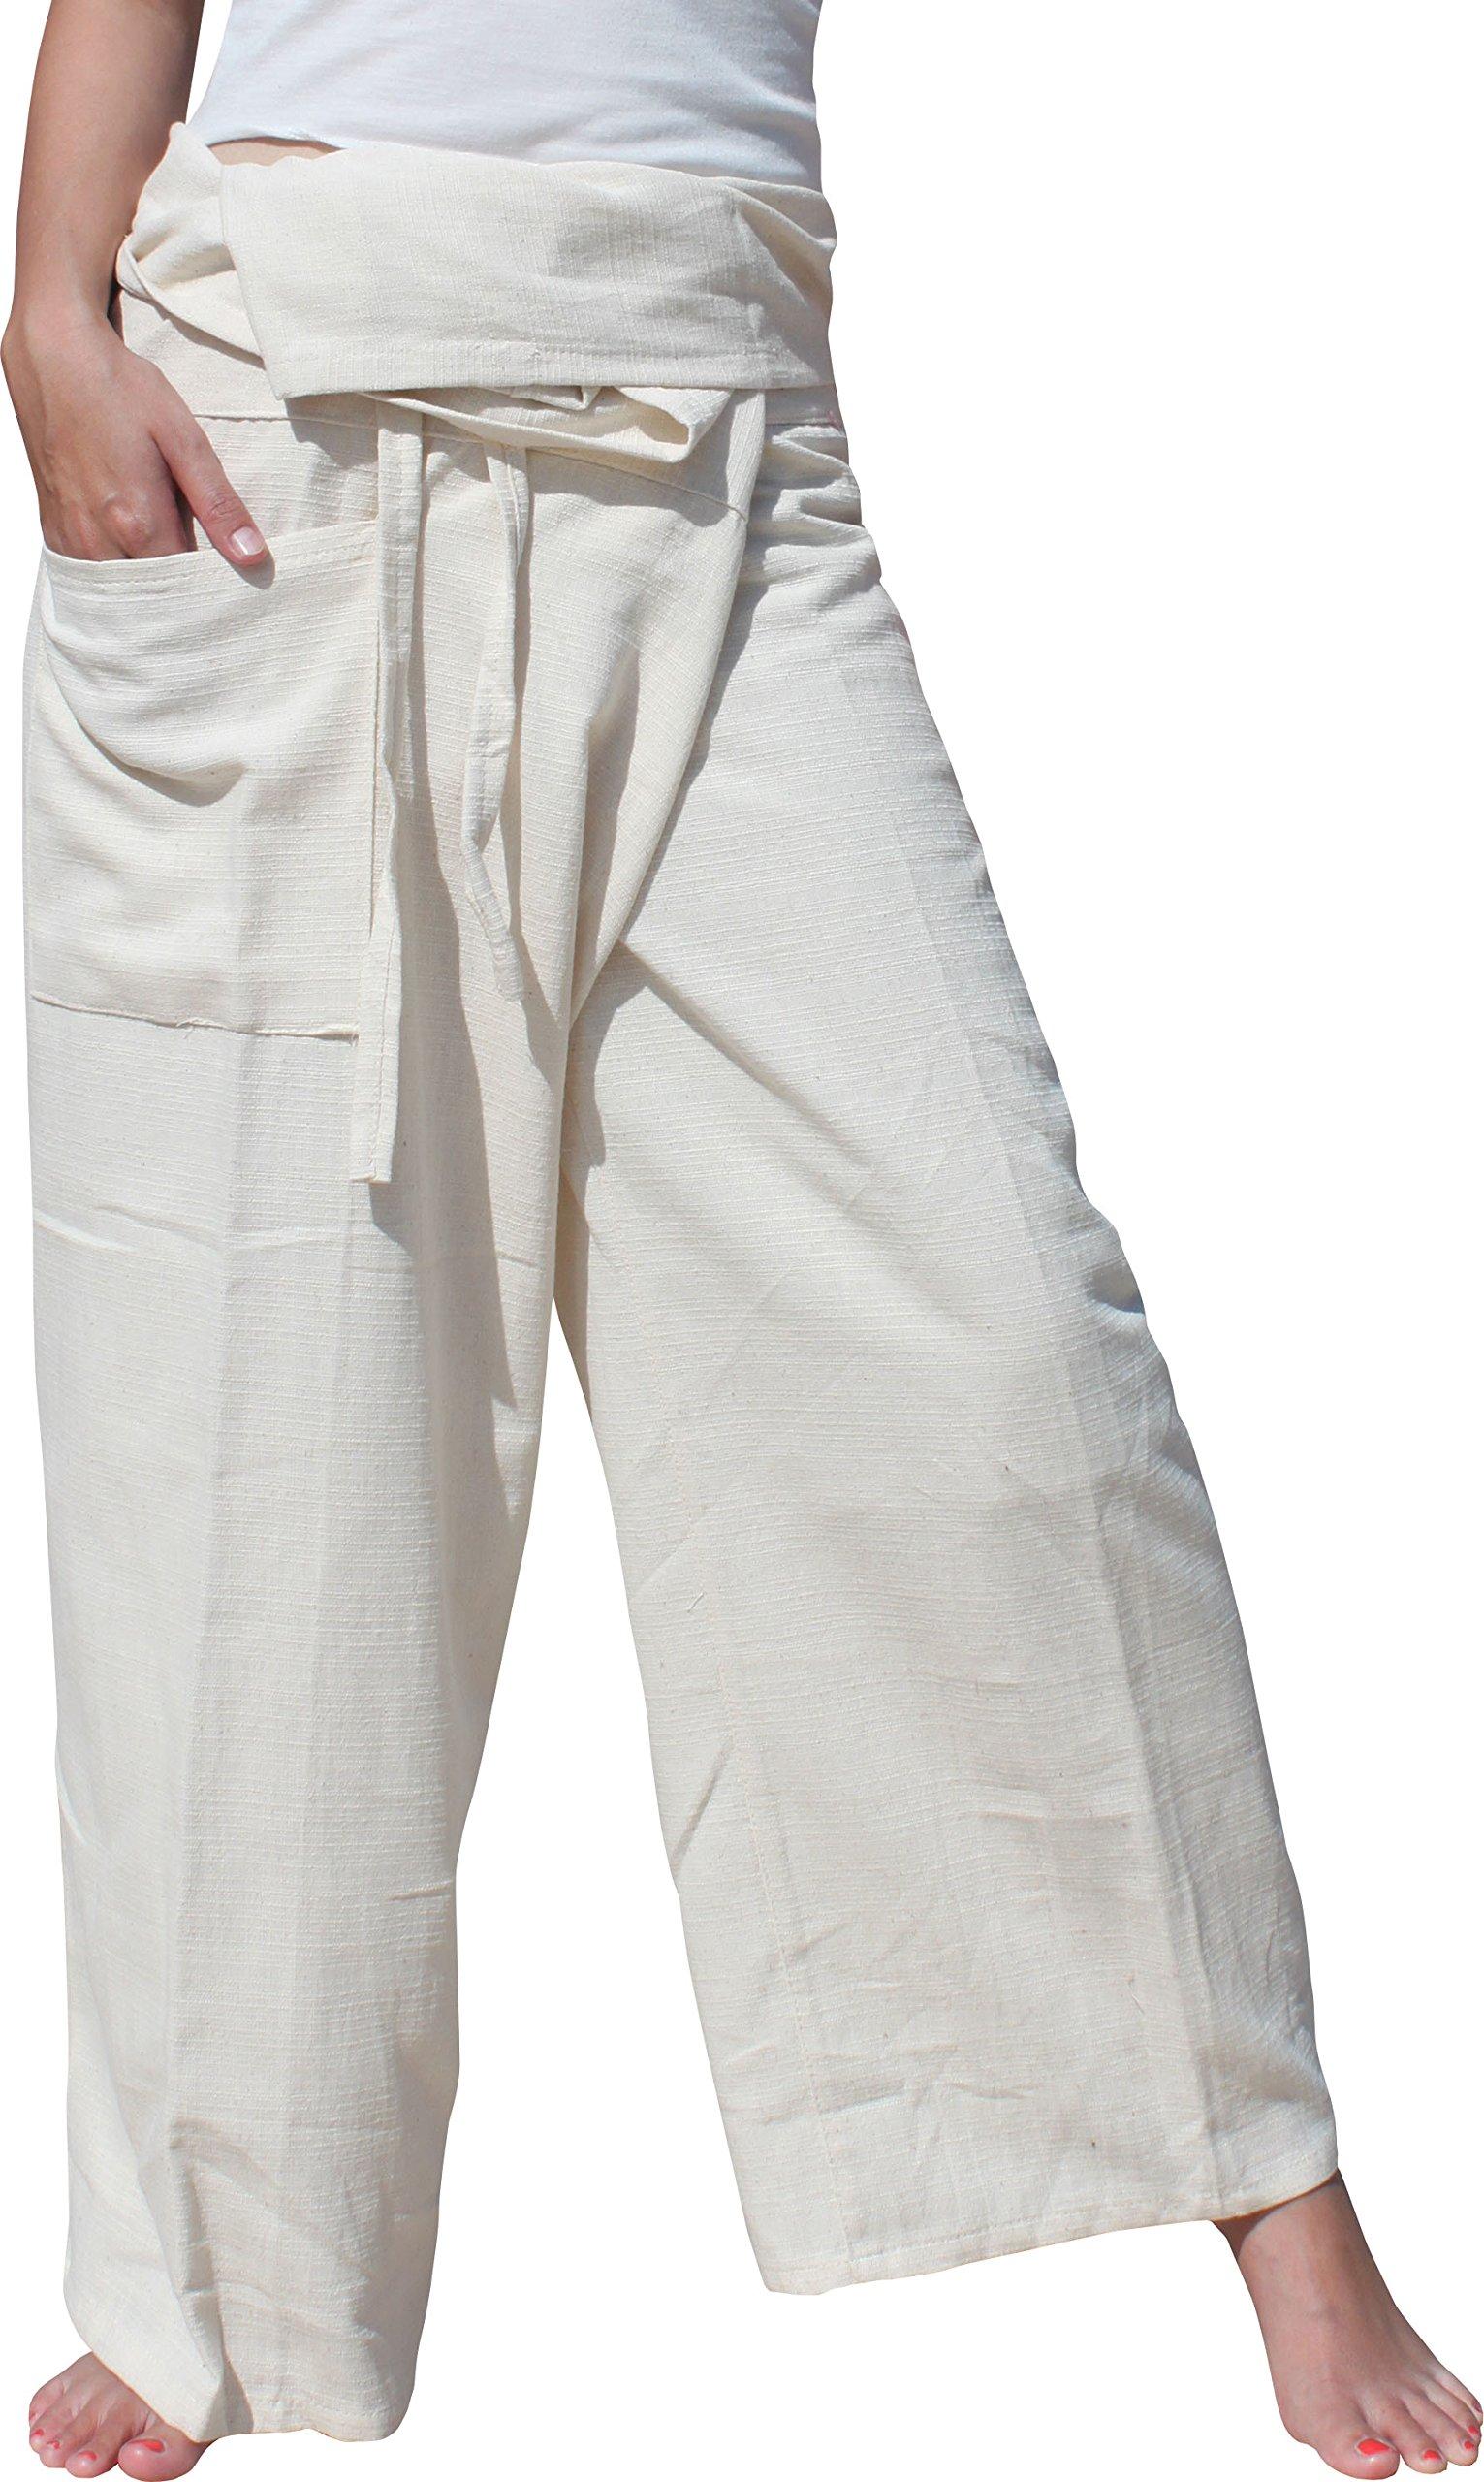 Raan Pah Muang Brand Plain Thick Line Cotton Thai Fisherman Wrap Tall Length Pants, X-Large, Cream by Raan Pah Muang